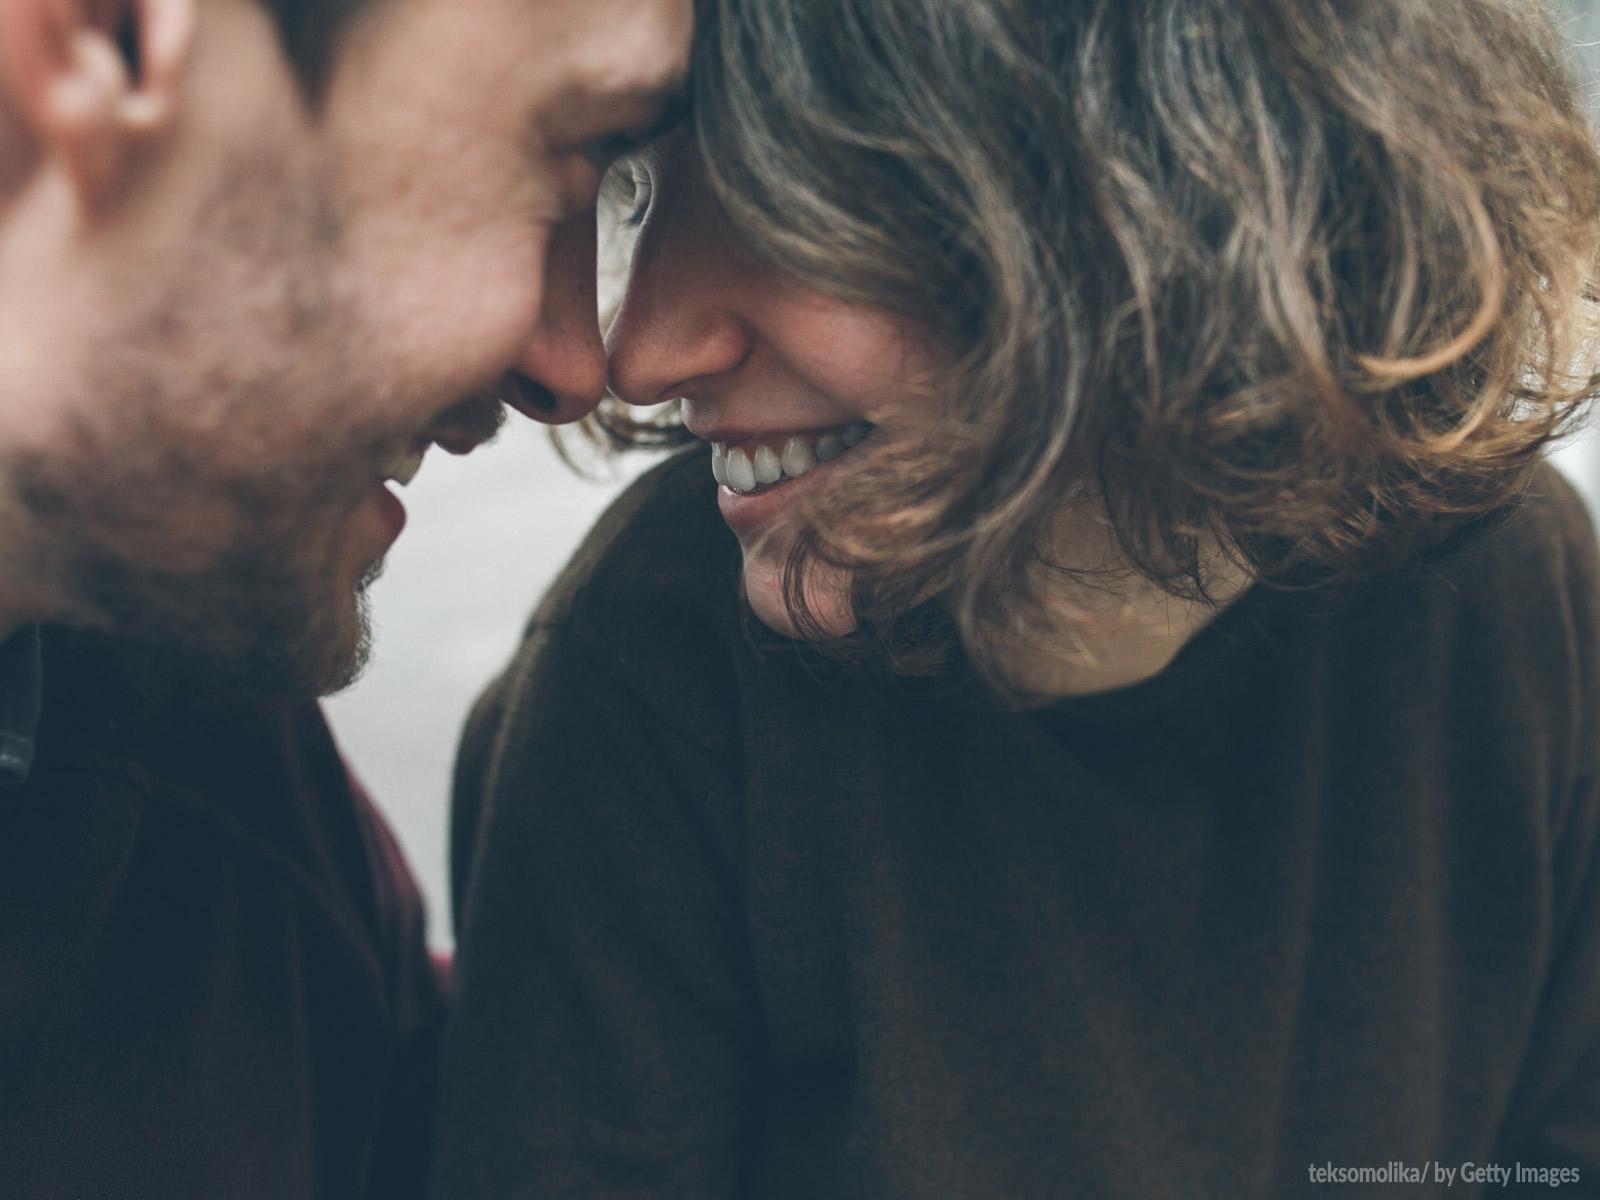 O lazer na vida conjugal